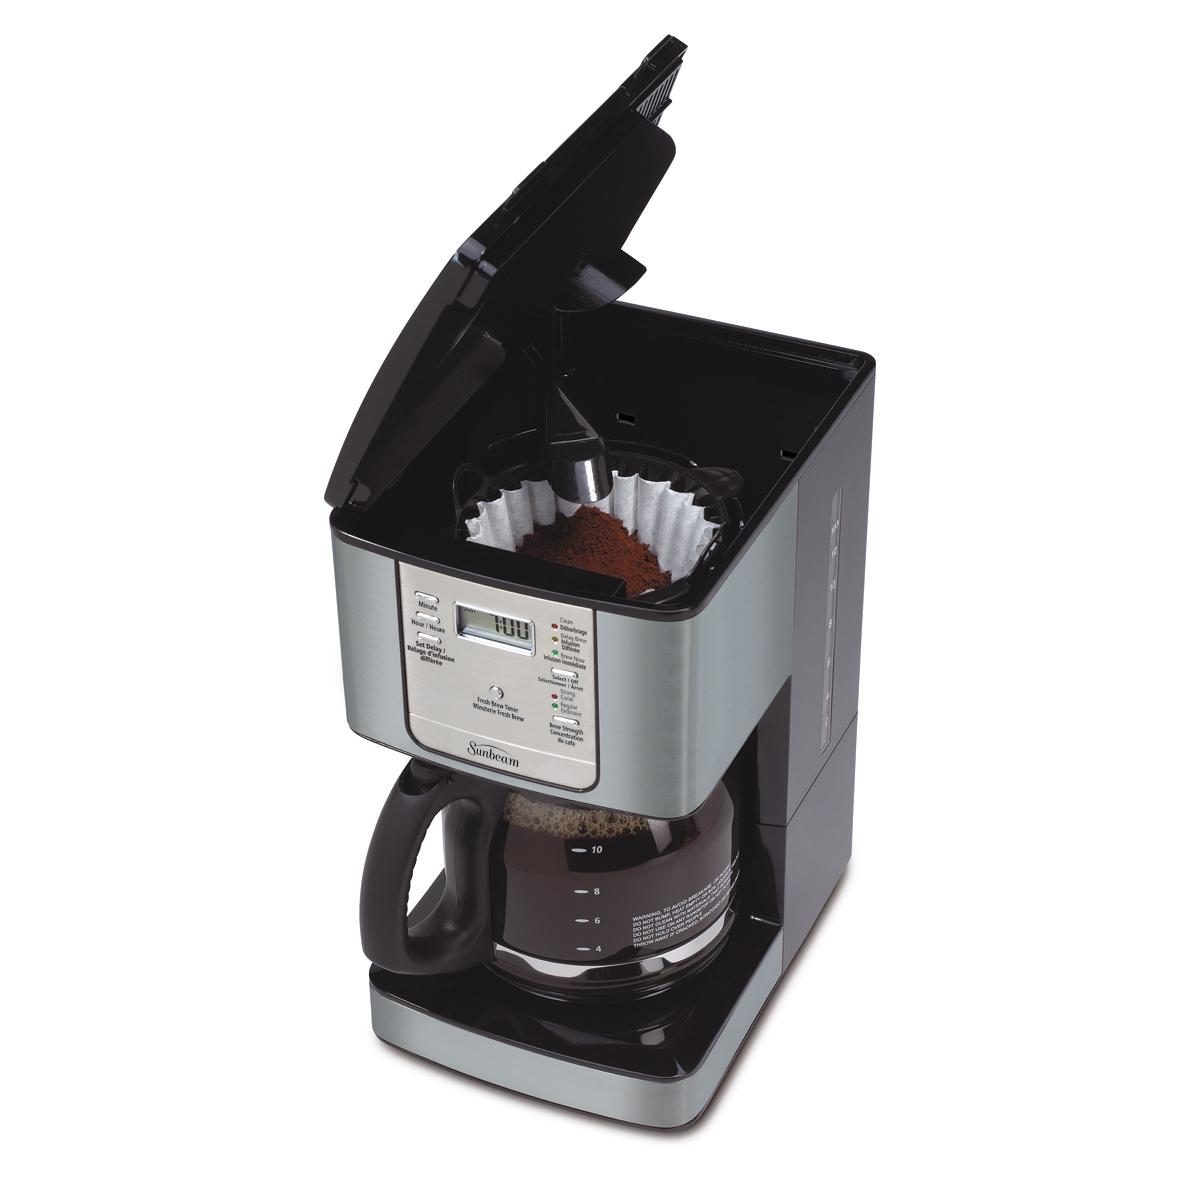 Sunbeam Programmable Coffee Maker Manual : Sunbeam 12-Cup Programmable Coffeemaker, Smoke Pearl BVSBJWX27SP-033 Sunbeam Canada